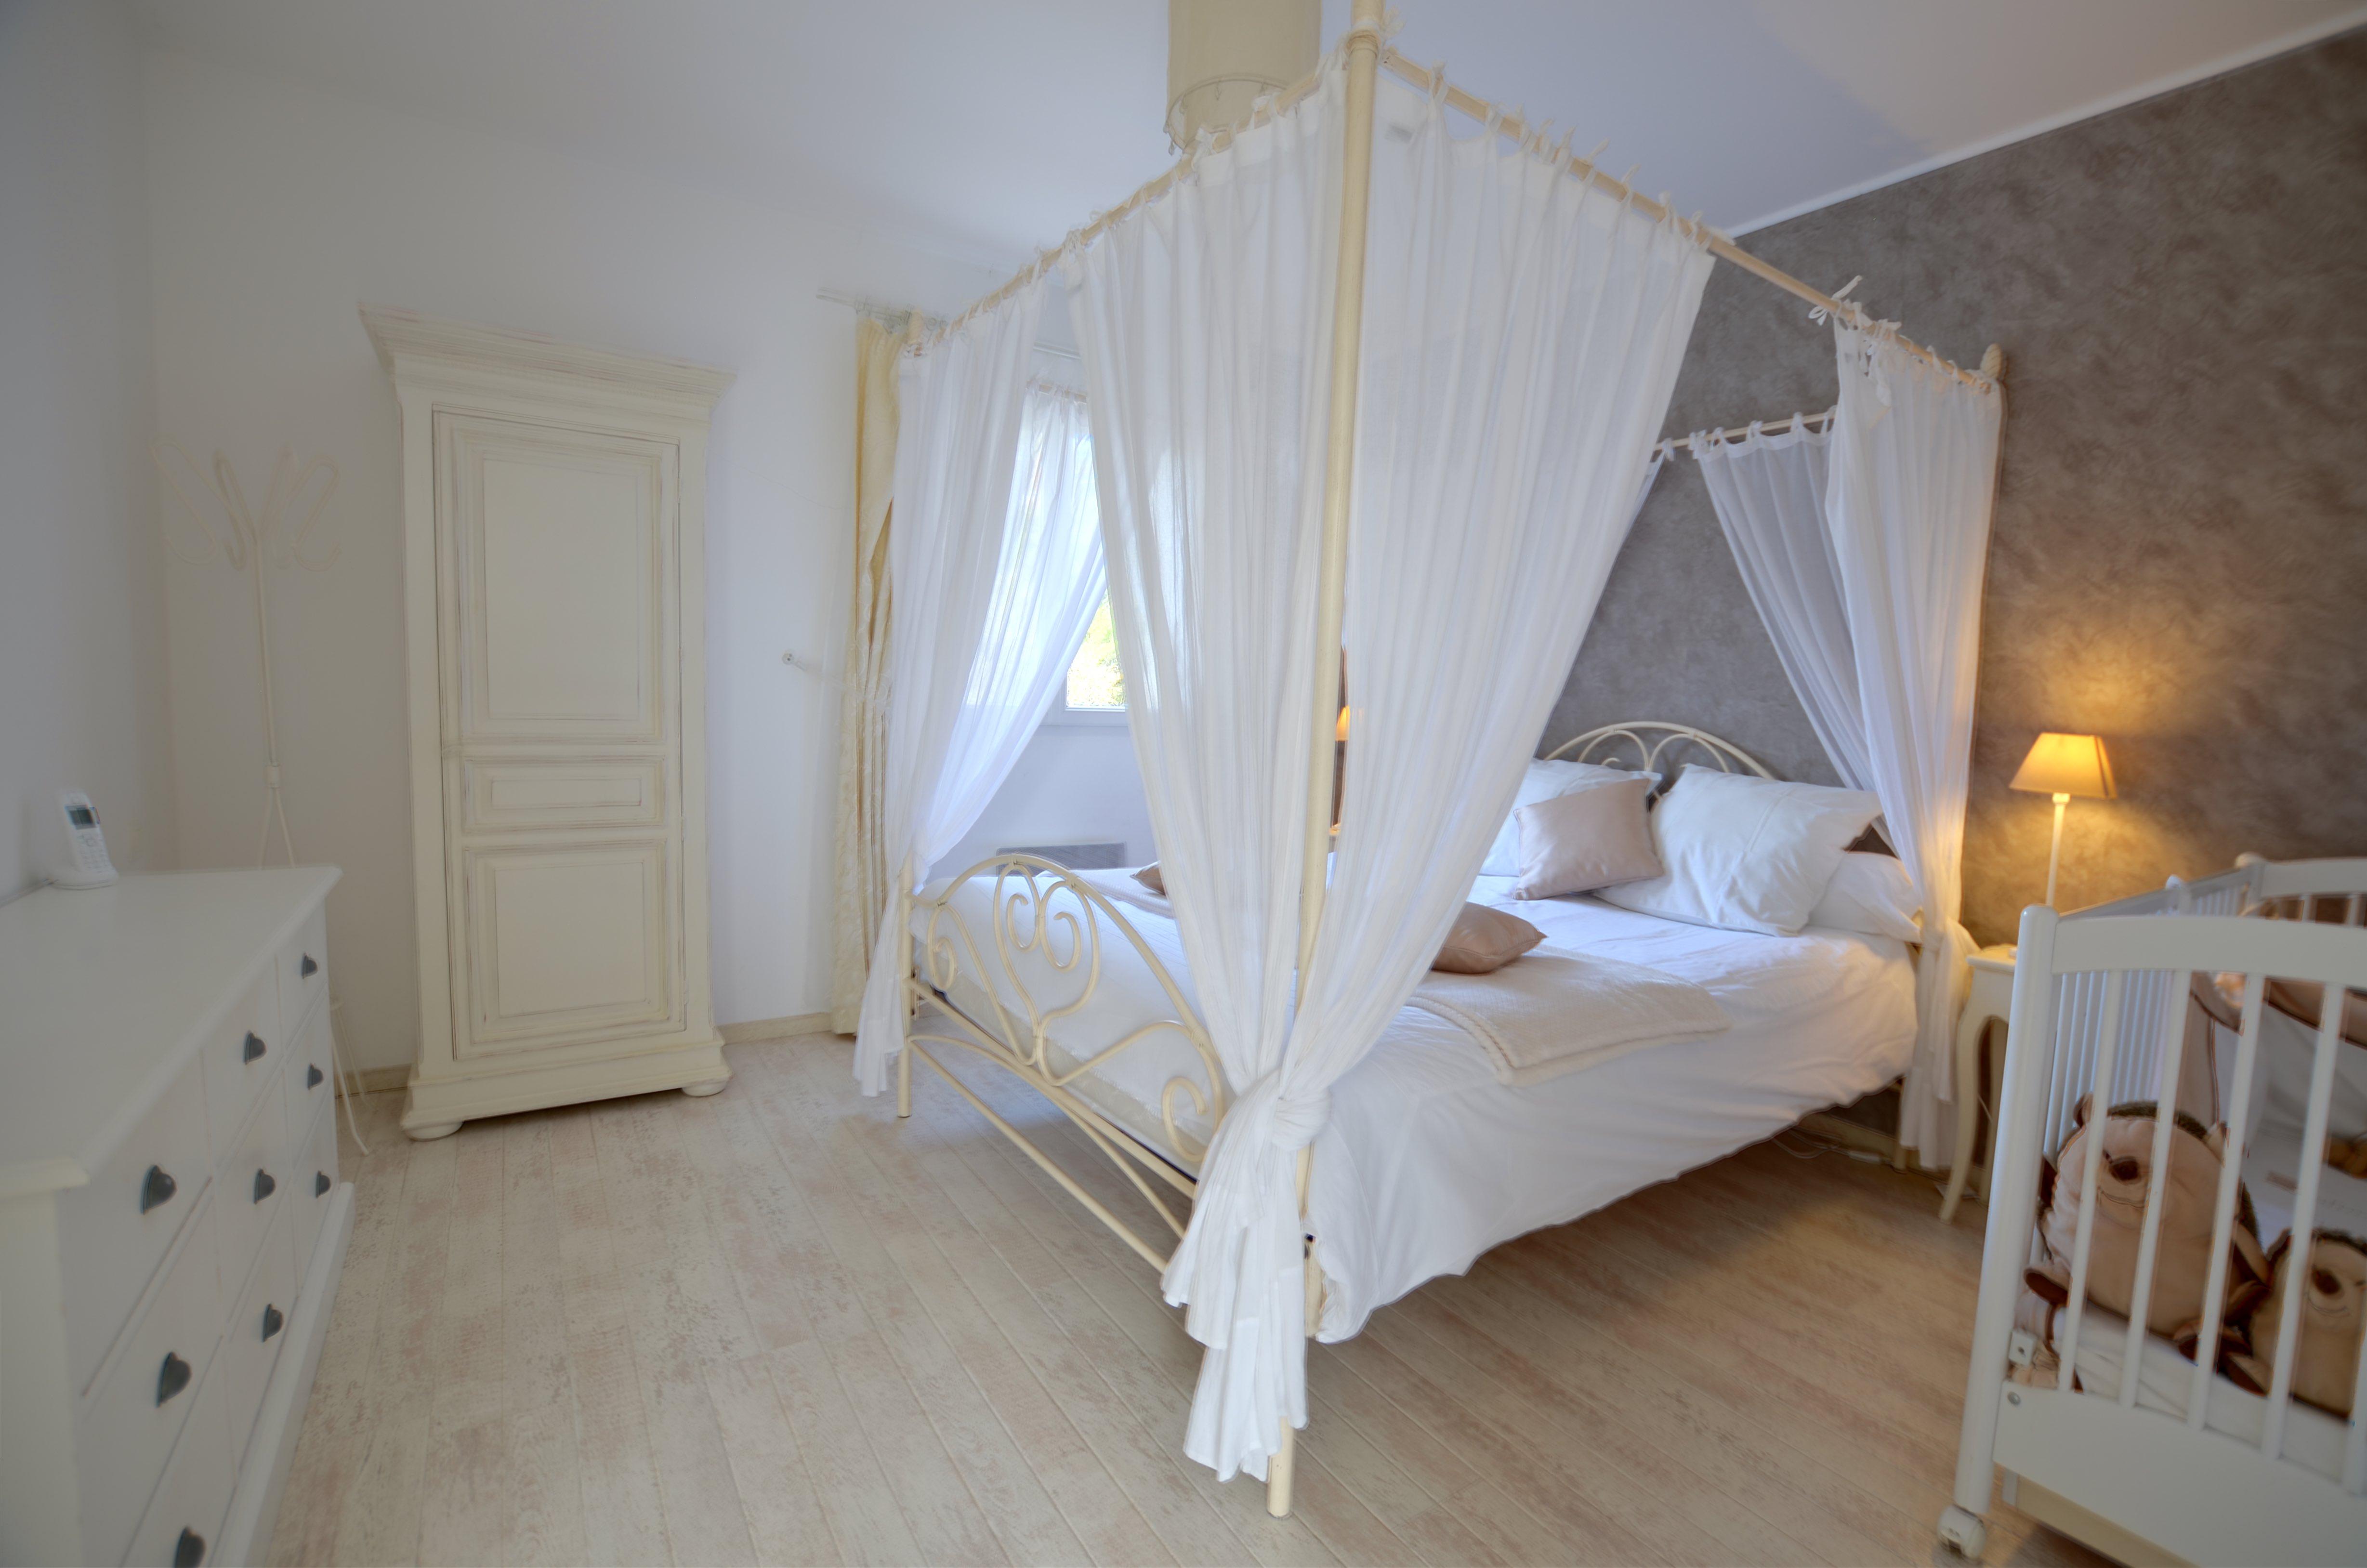 chambre romatique Villa Eden Gite piscine interieure de luxe